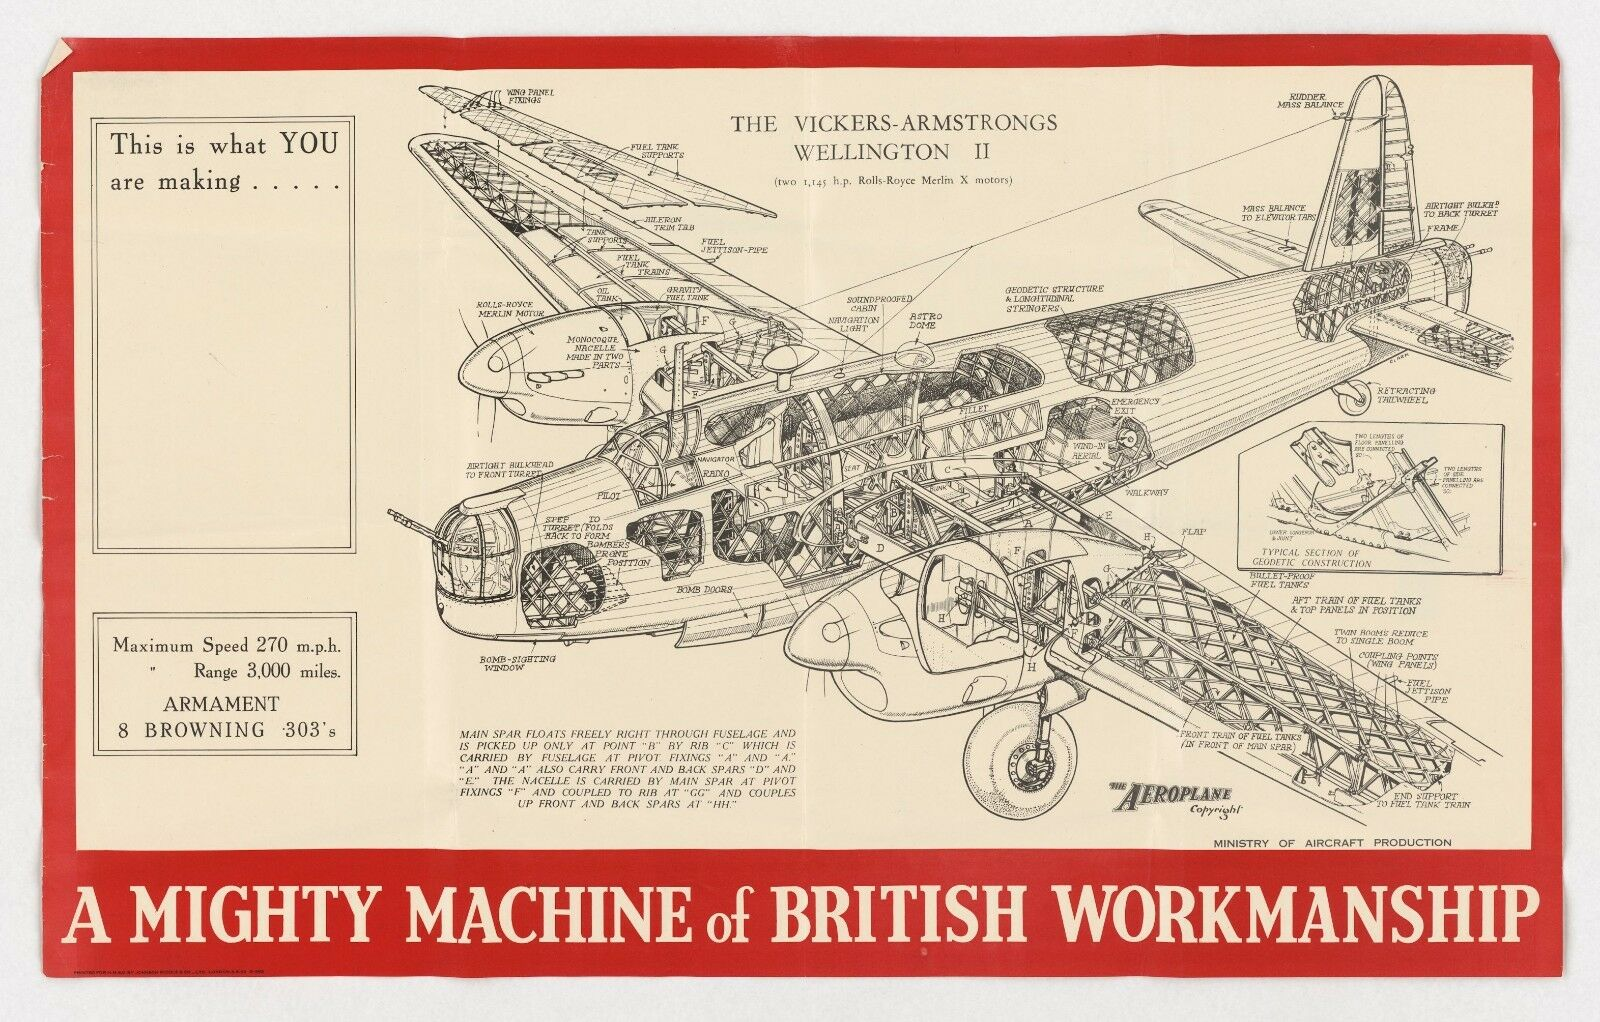 WW2 RAF WELLINGTON 2 POSTER PRINT